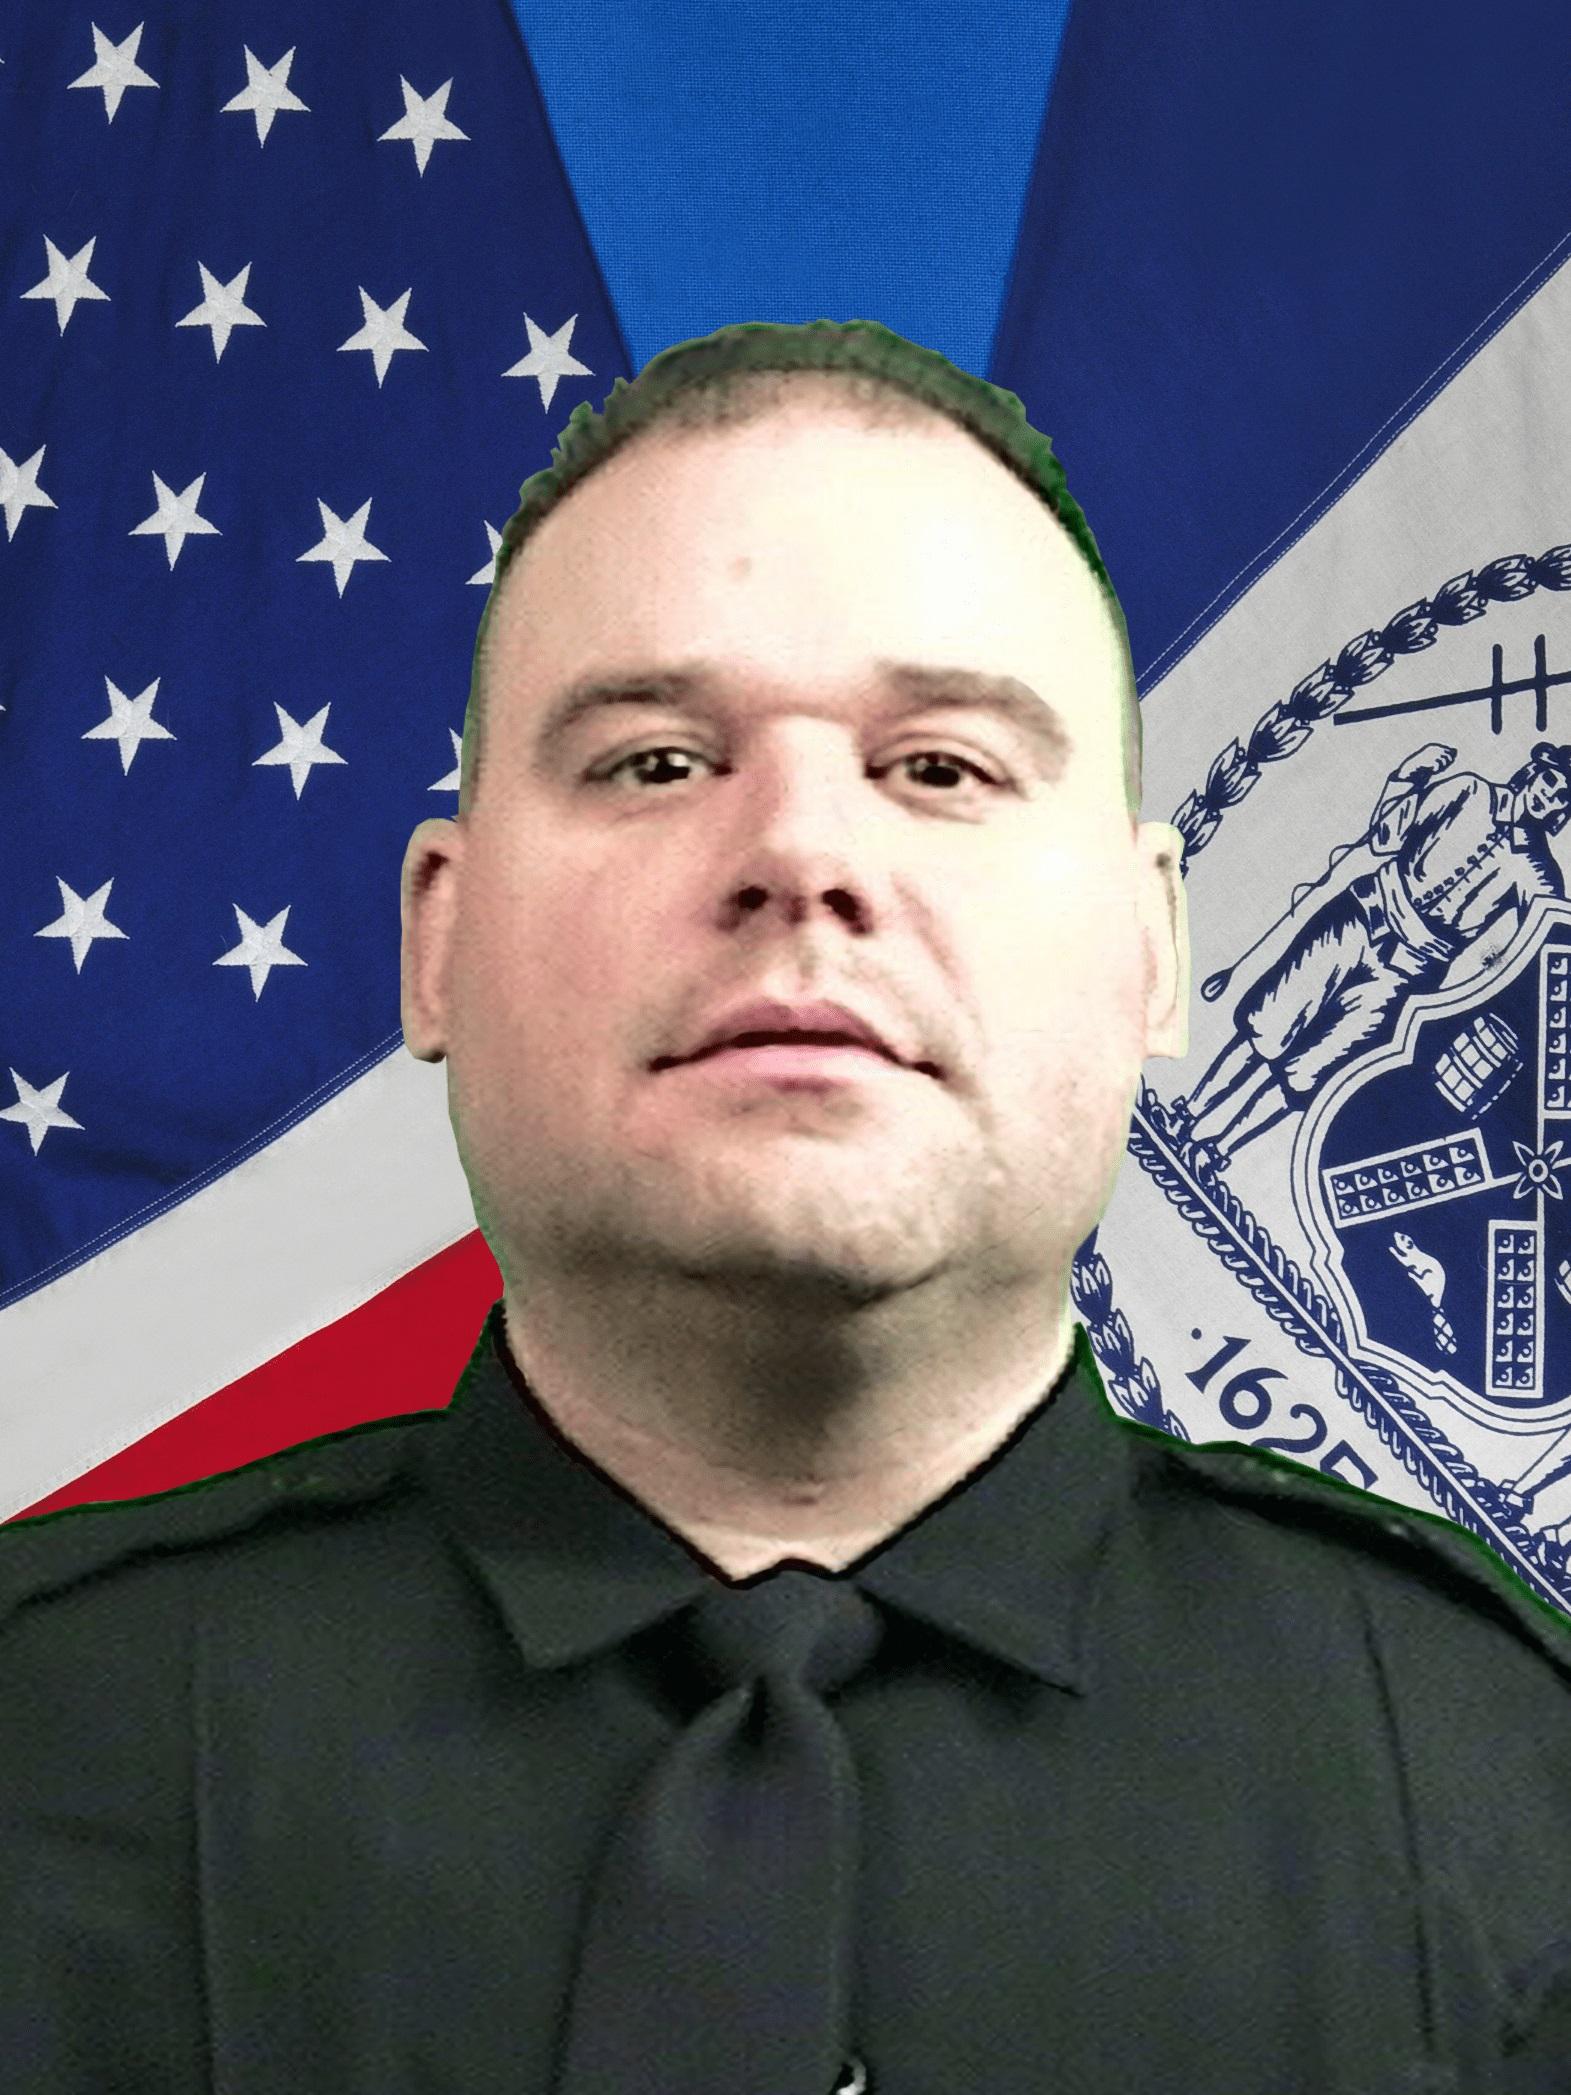 Police Officer Anthony R. Hanlon | New York City Police Department, New York